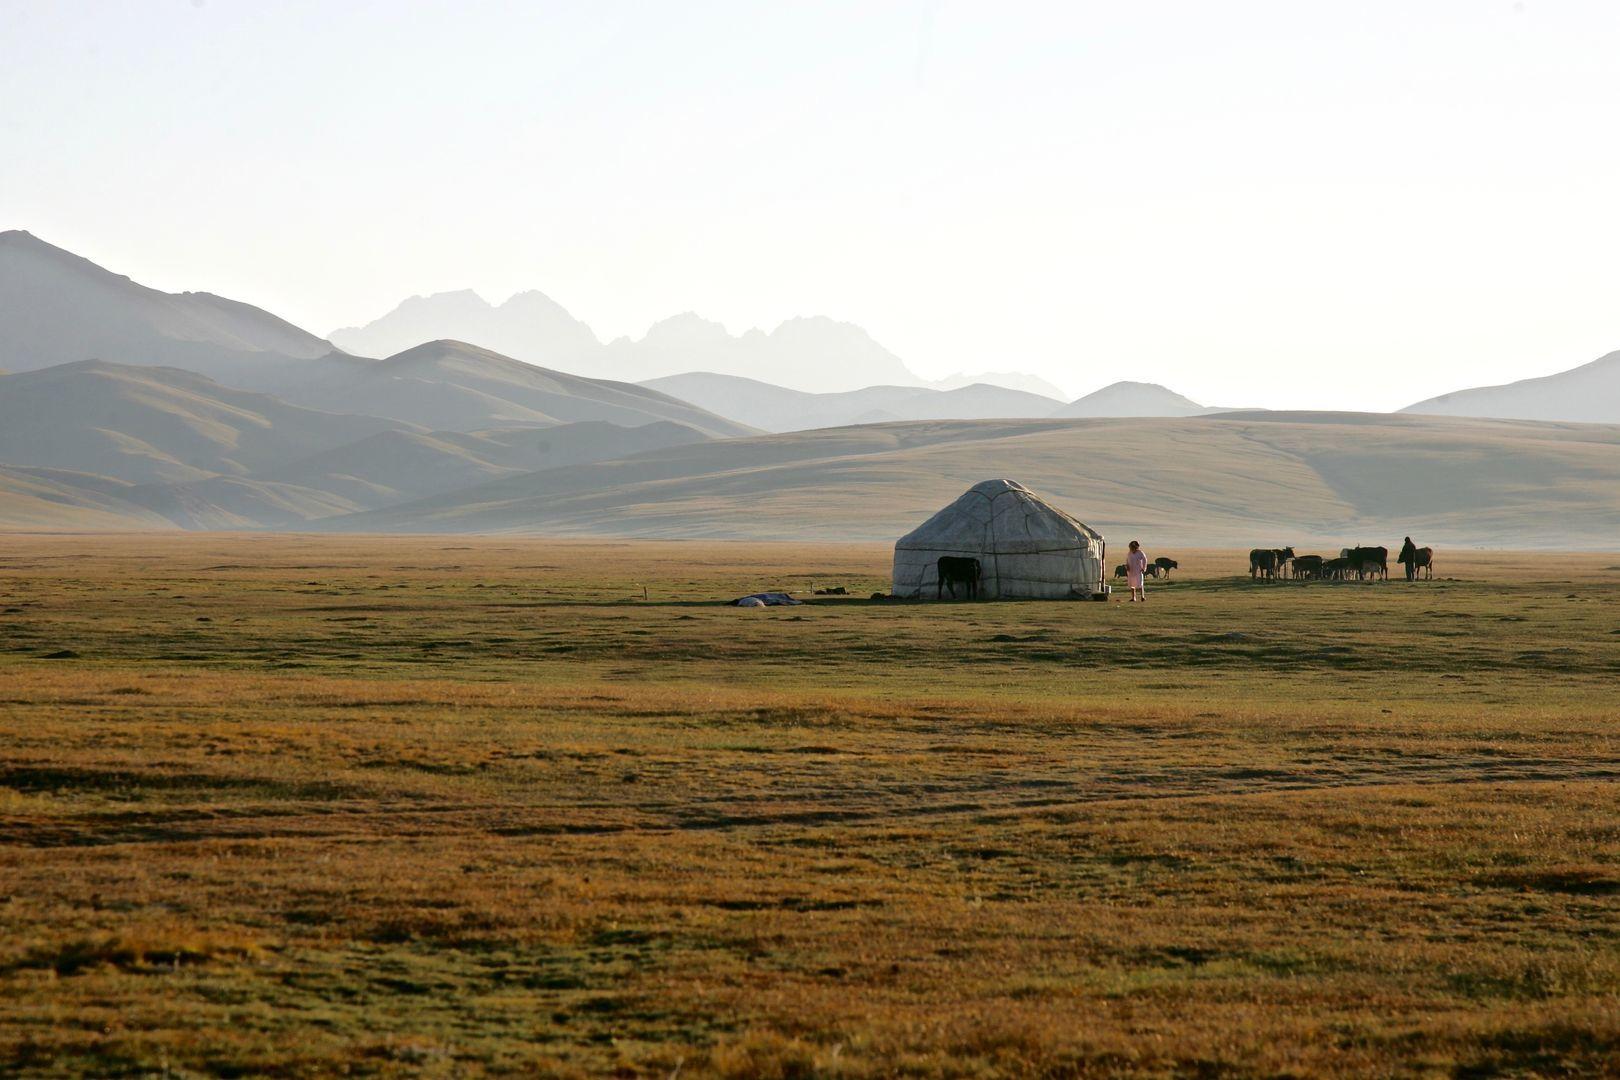 Song Kul lake and pasture in Kyrgyzstan trip